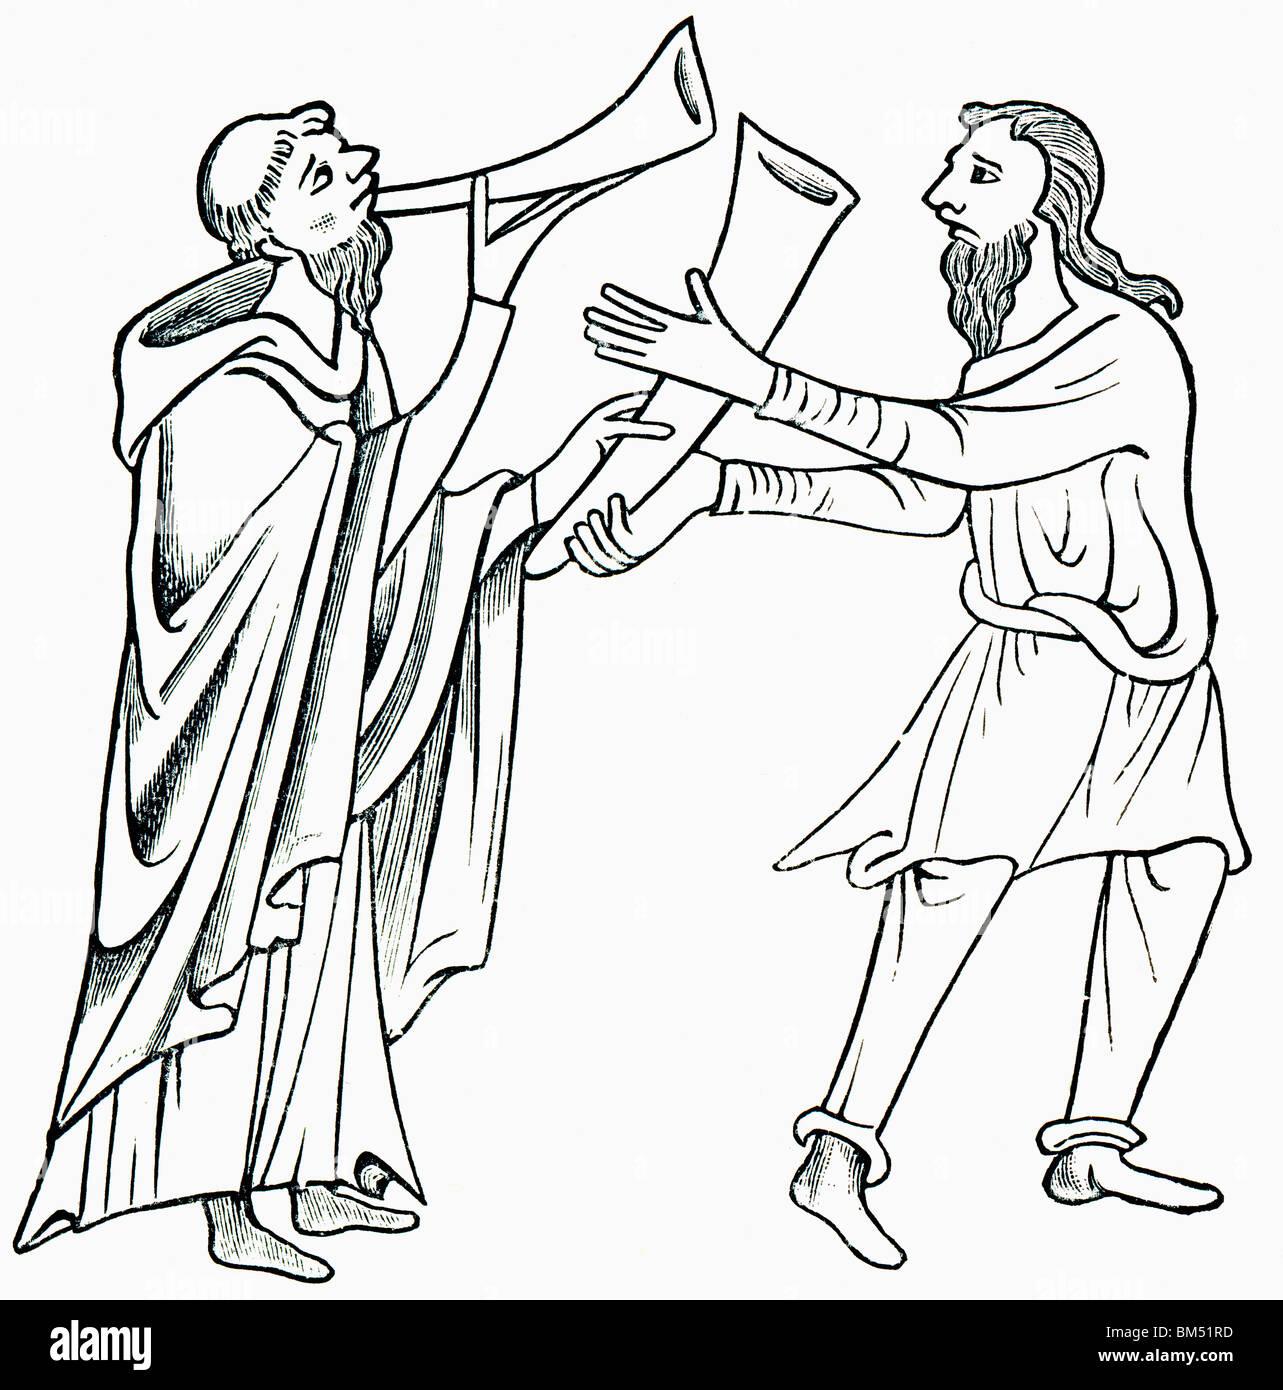 The Legend of Saint Patrick's Horn. - Stock Image